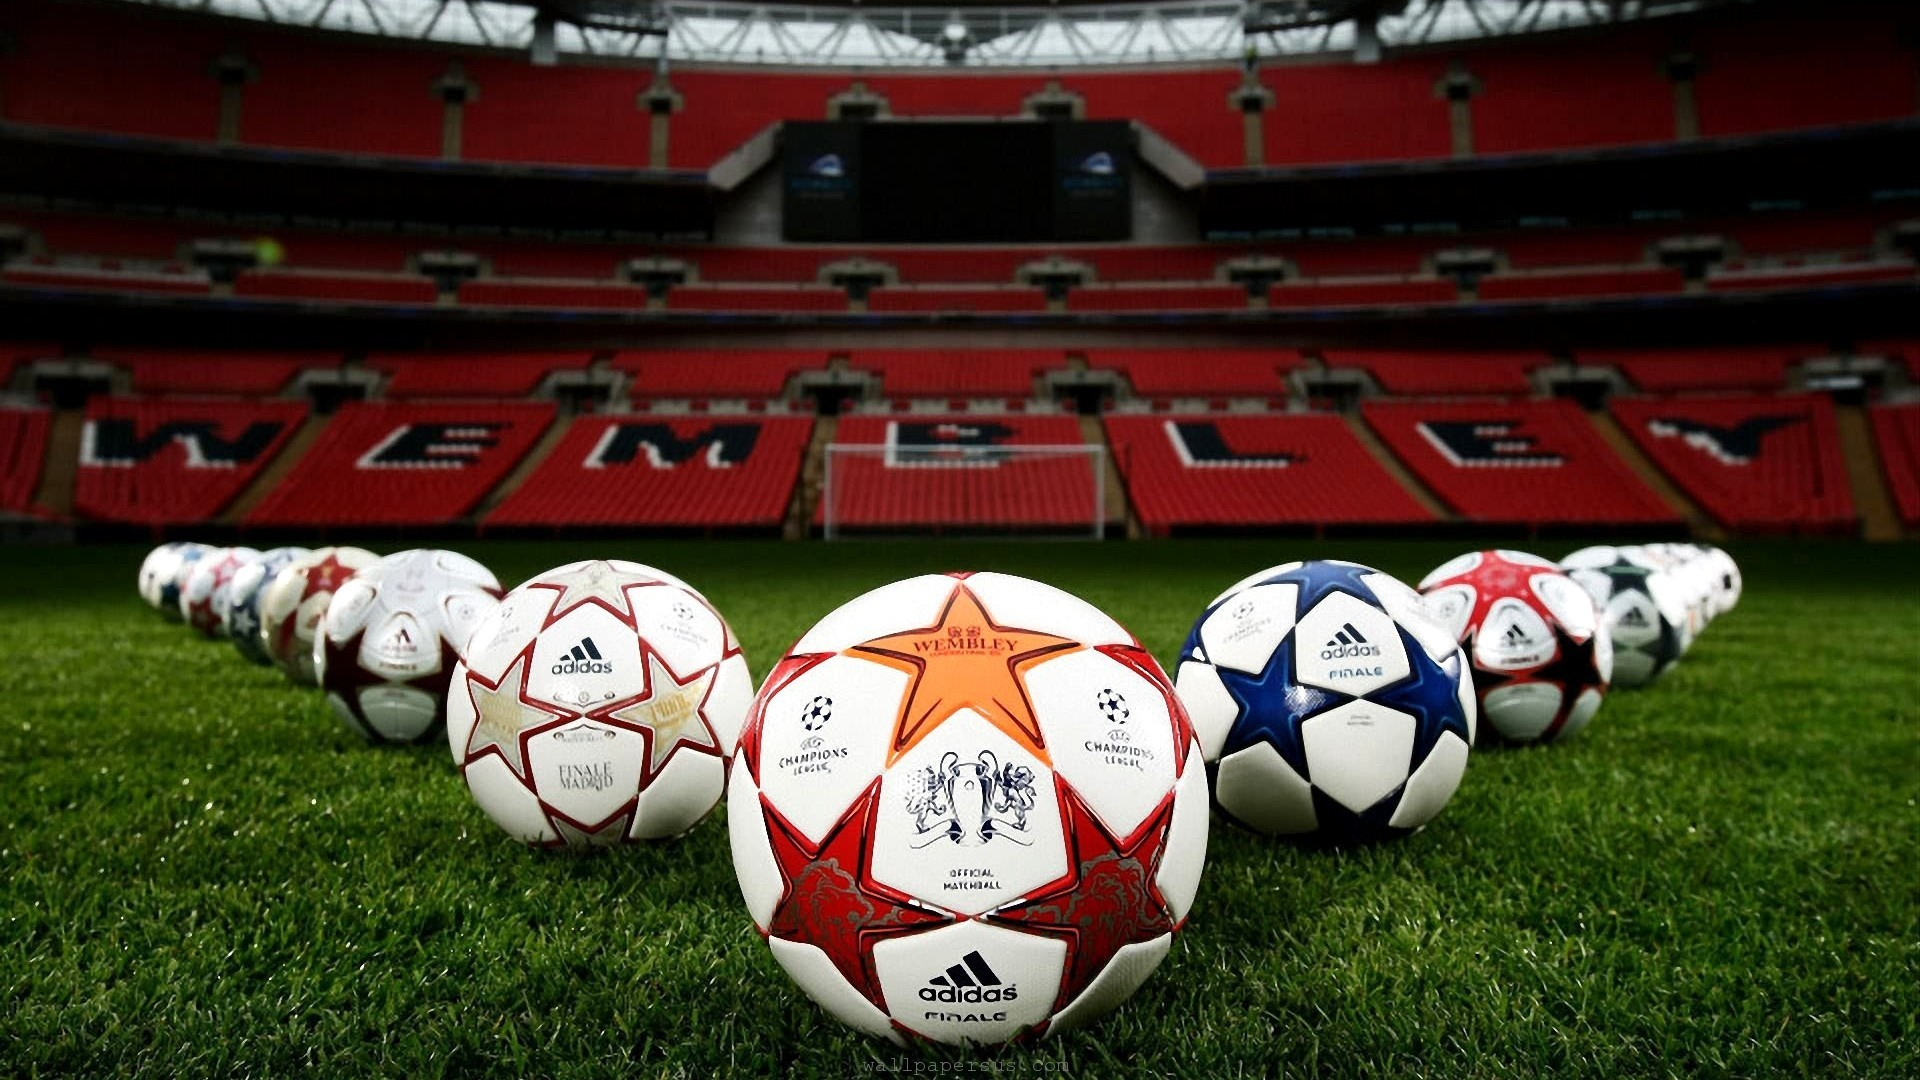 Res: 1920x1080, UEFA Champions League Ball Wallpaper